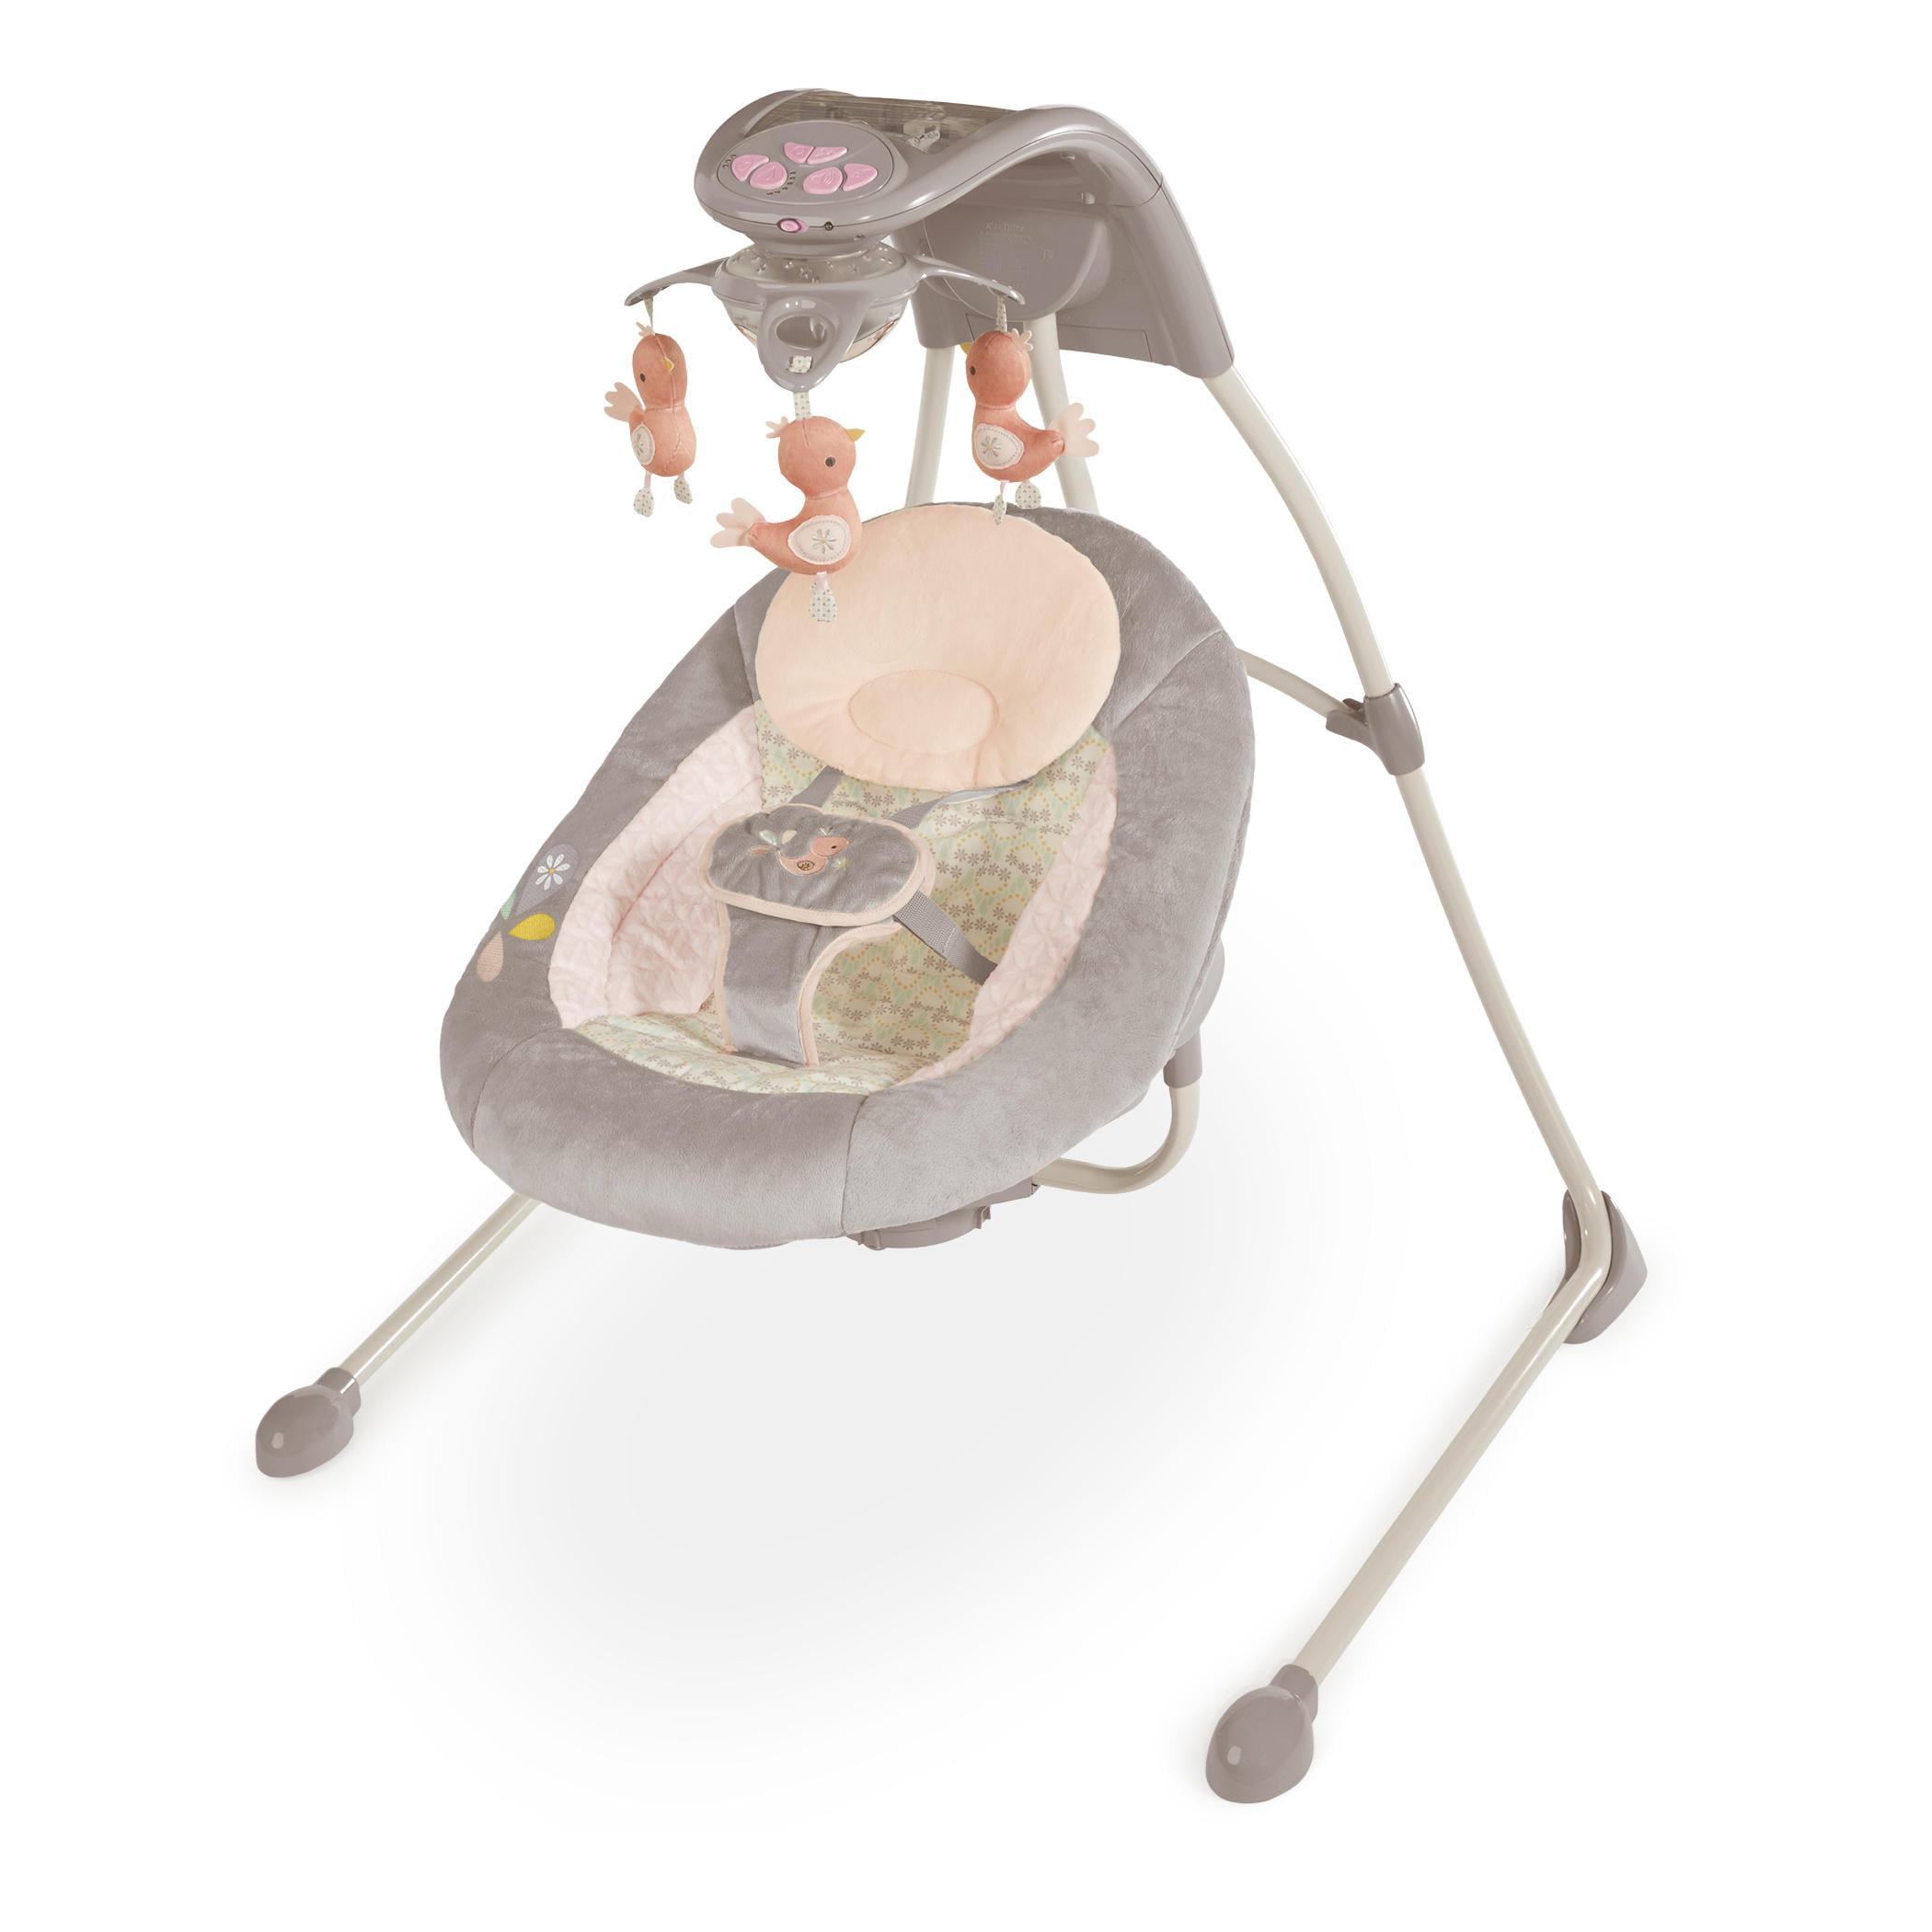 Ingenuity InLighten Cradling Swing Piper by Ingenuity